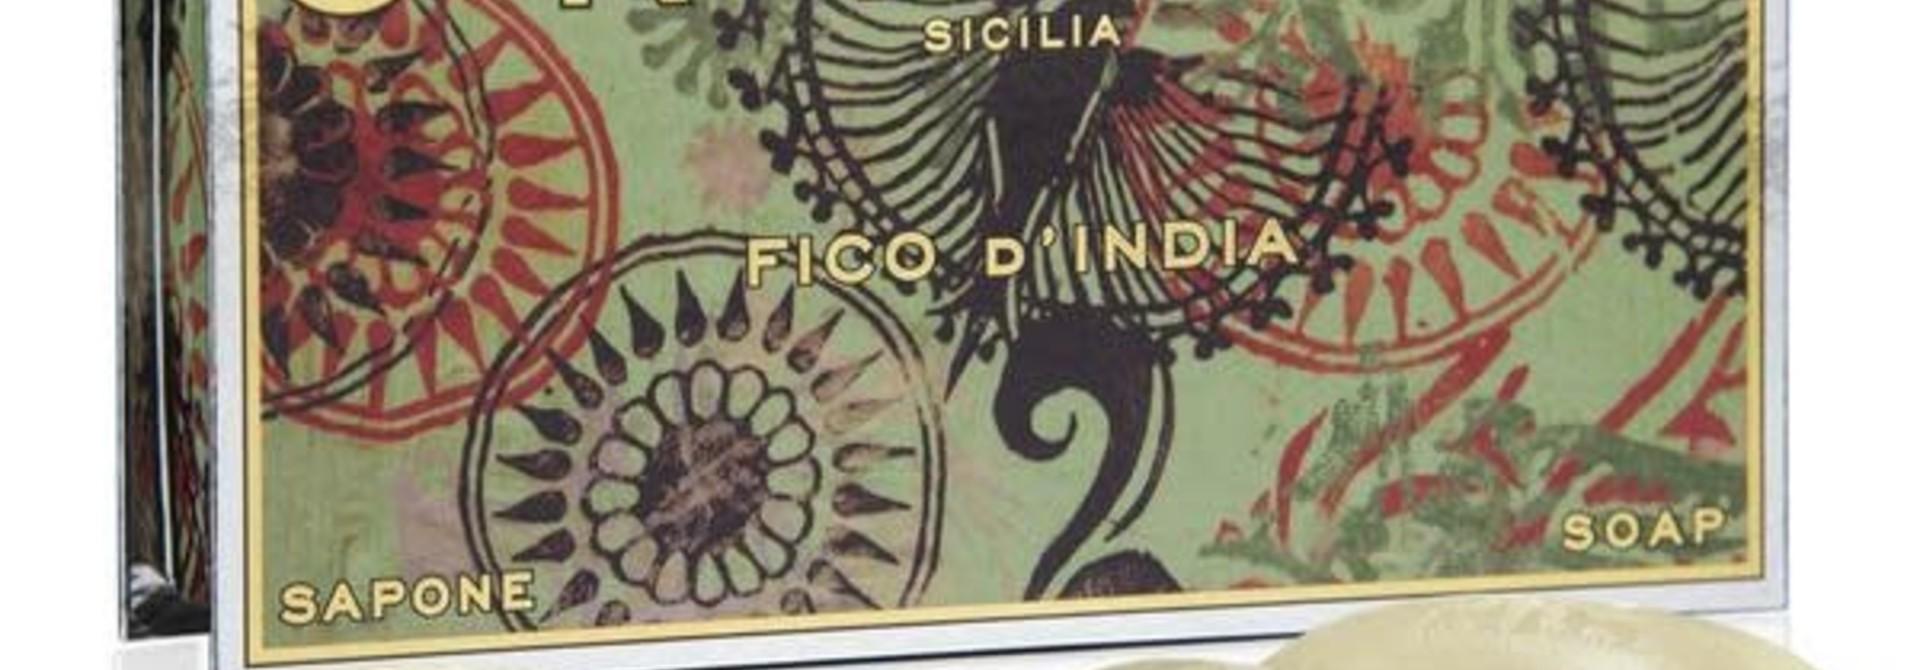 Ortigia Sicilia gift set soap Fico d'India 4x40gr.